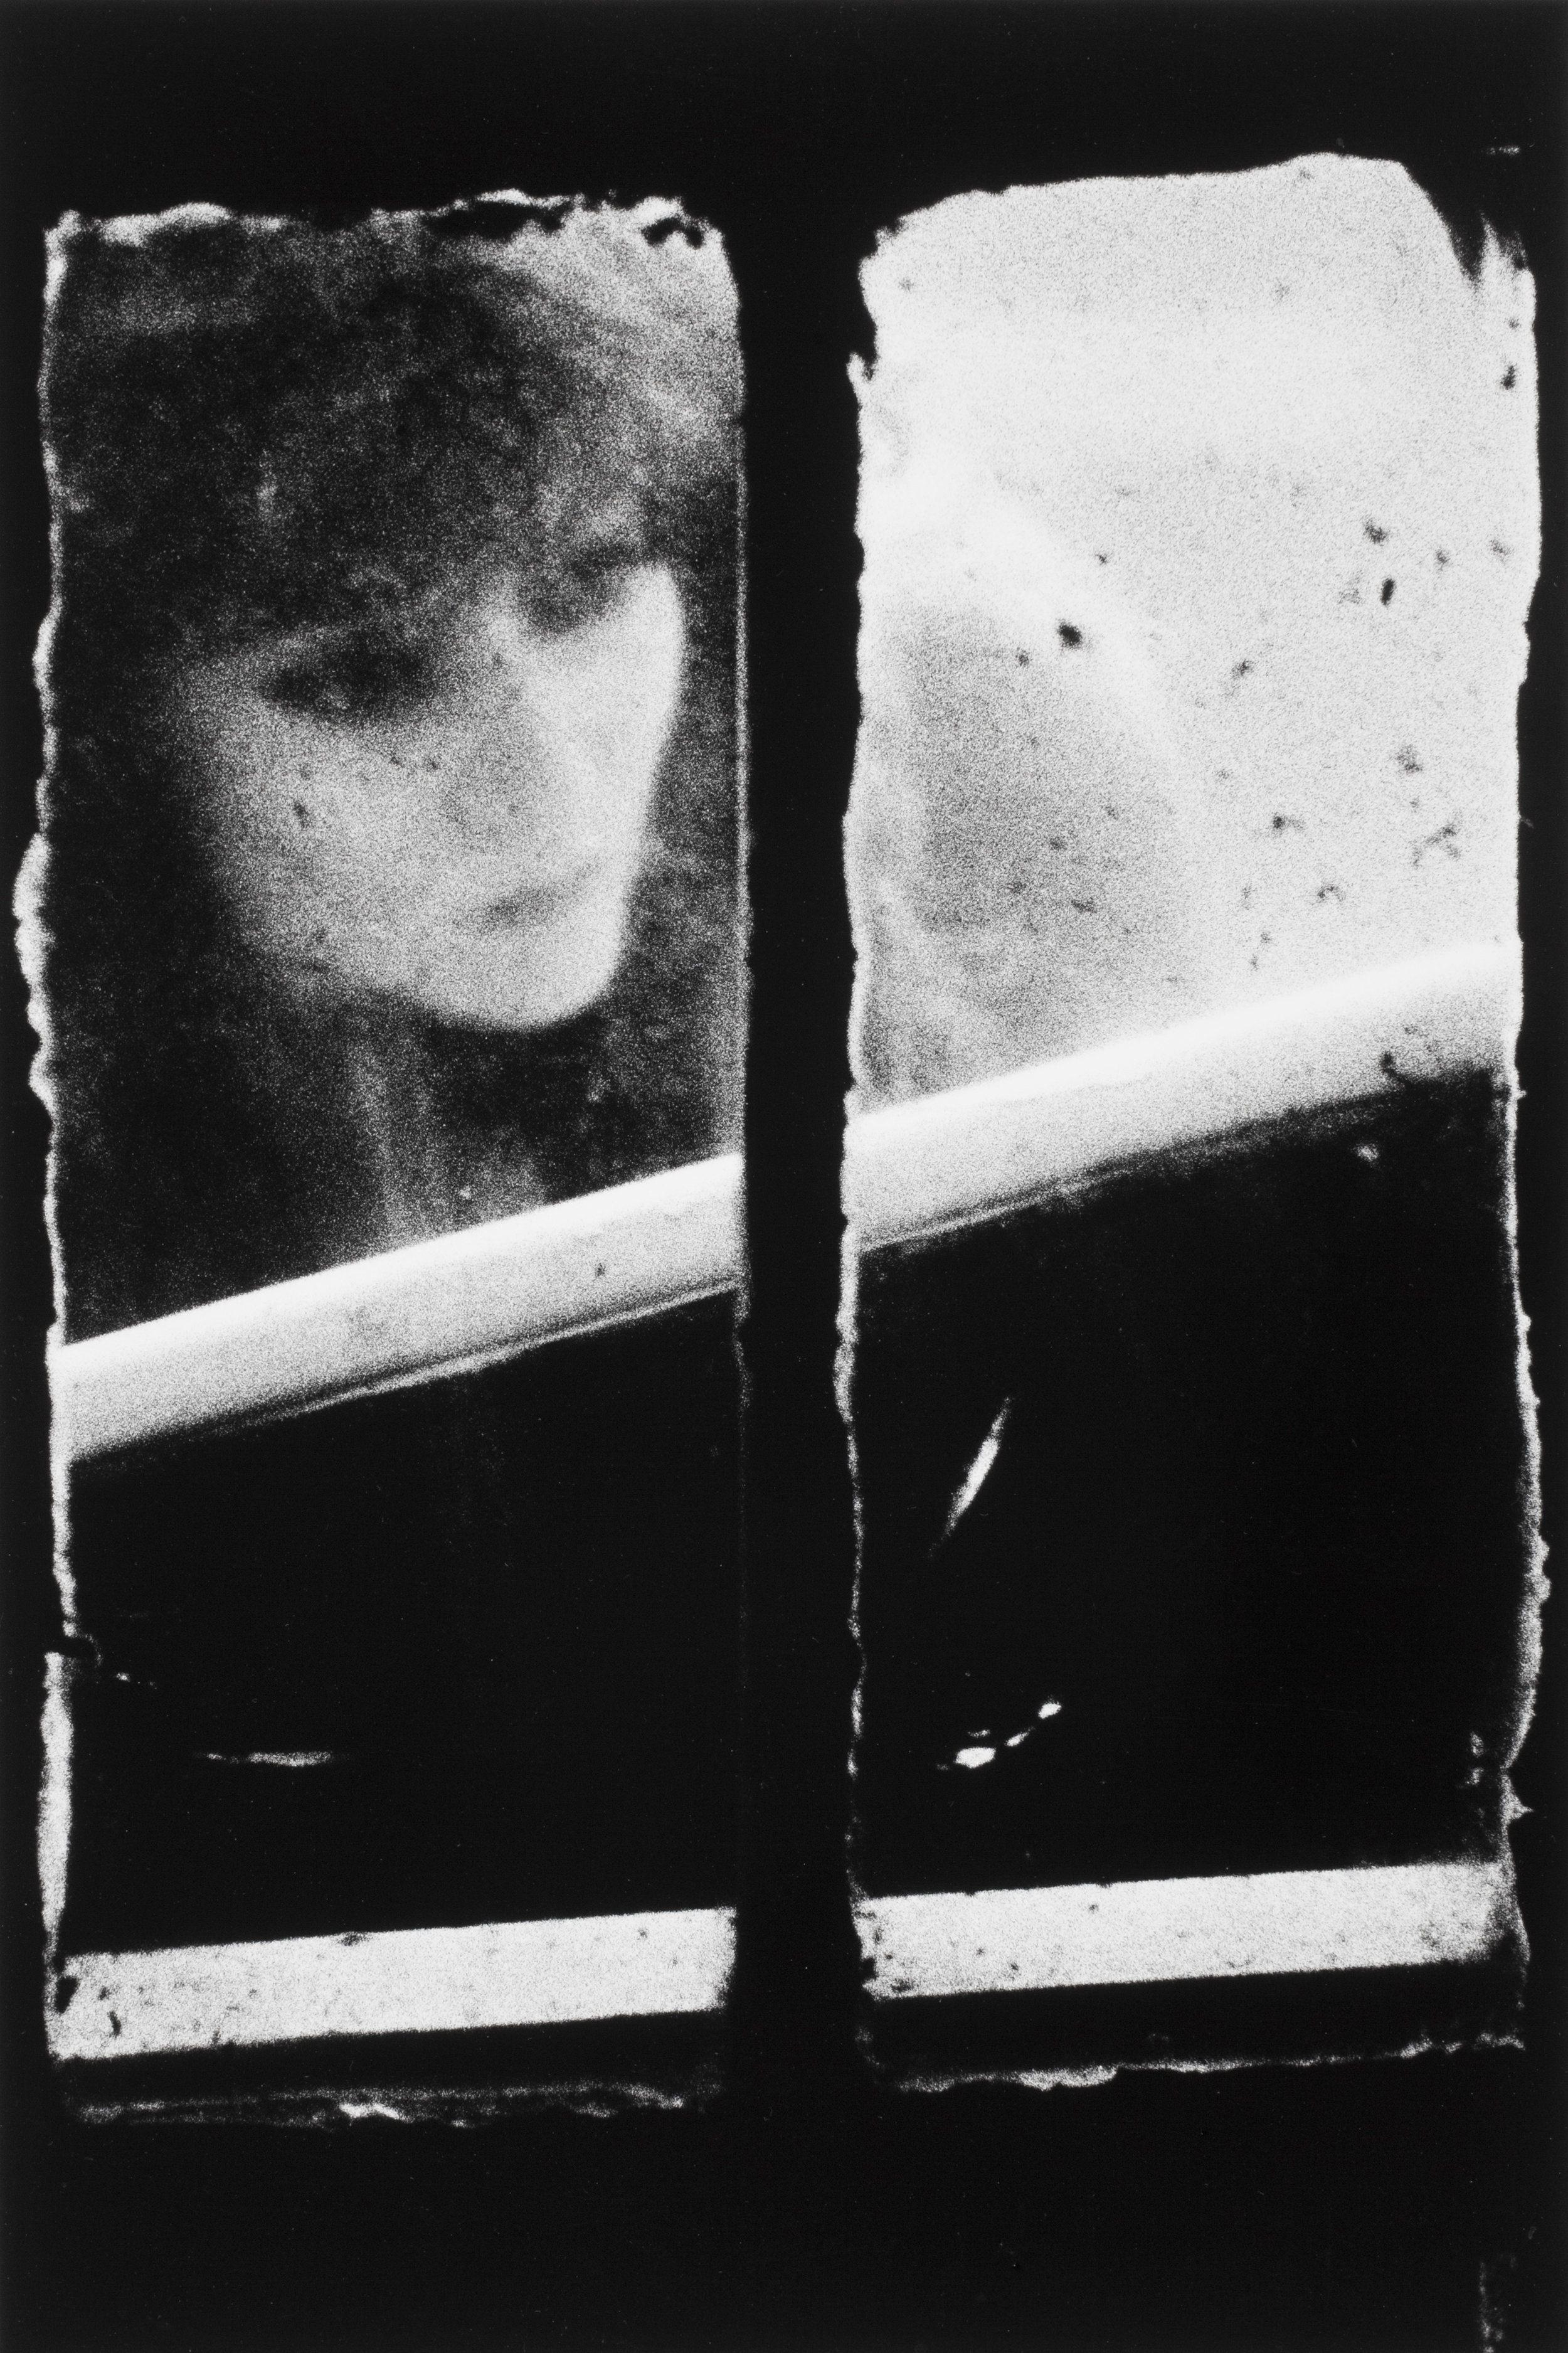 Merry Alpern, Dirty Windows Series #19, 1994, International Center of Photography, Gift of David and Kim Schrader, 2010. © Merry Alpern